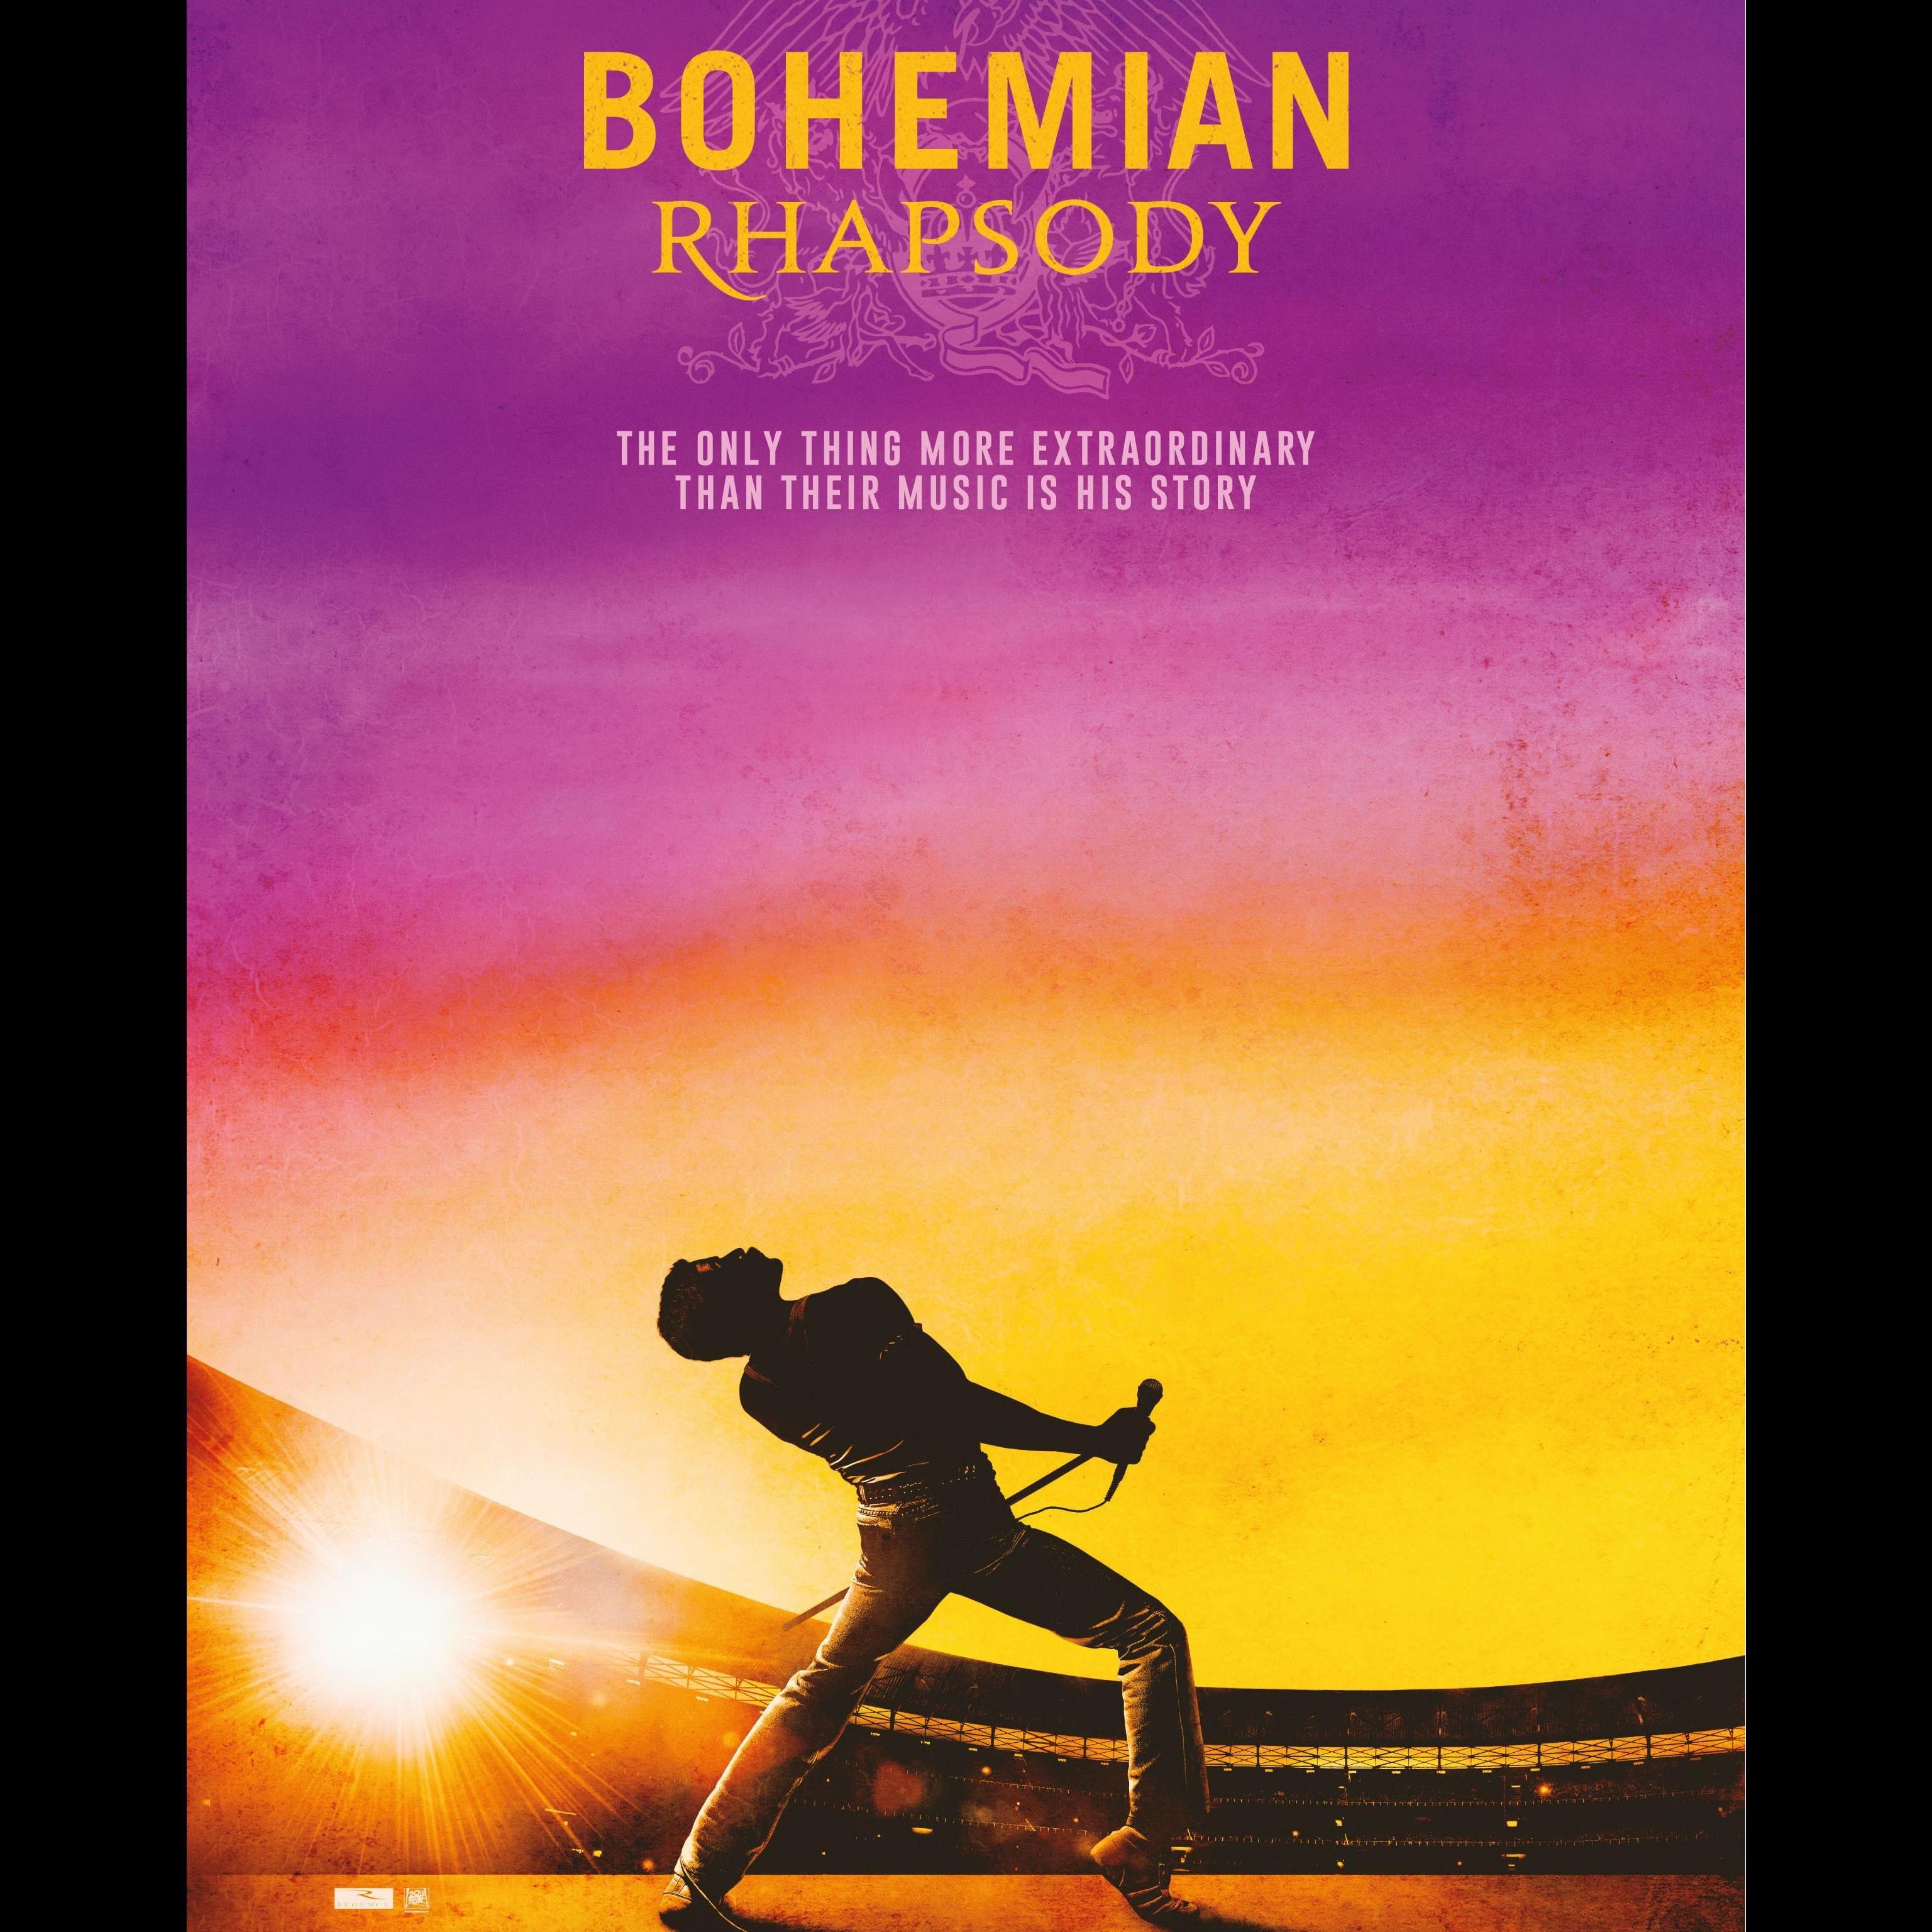 Bio - Bohemian Rhapsody